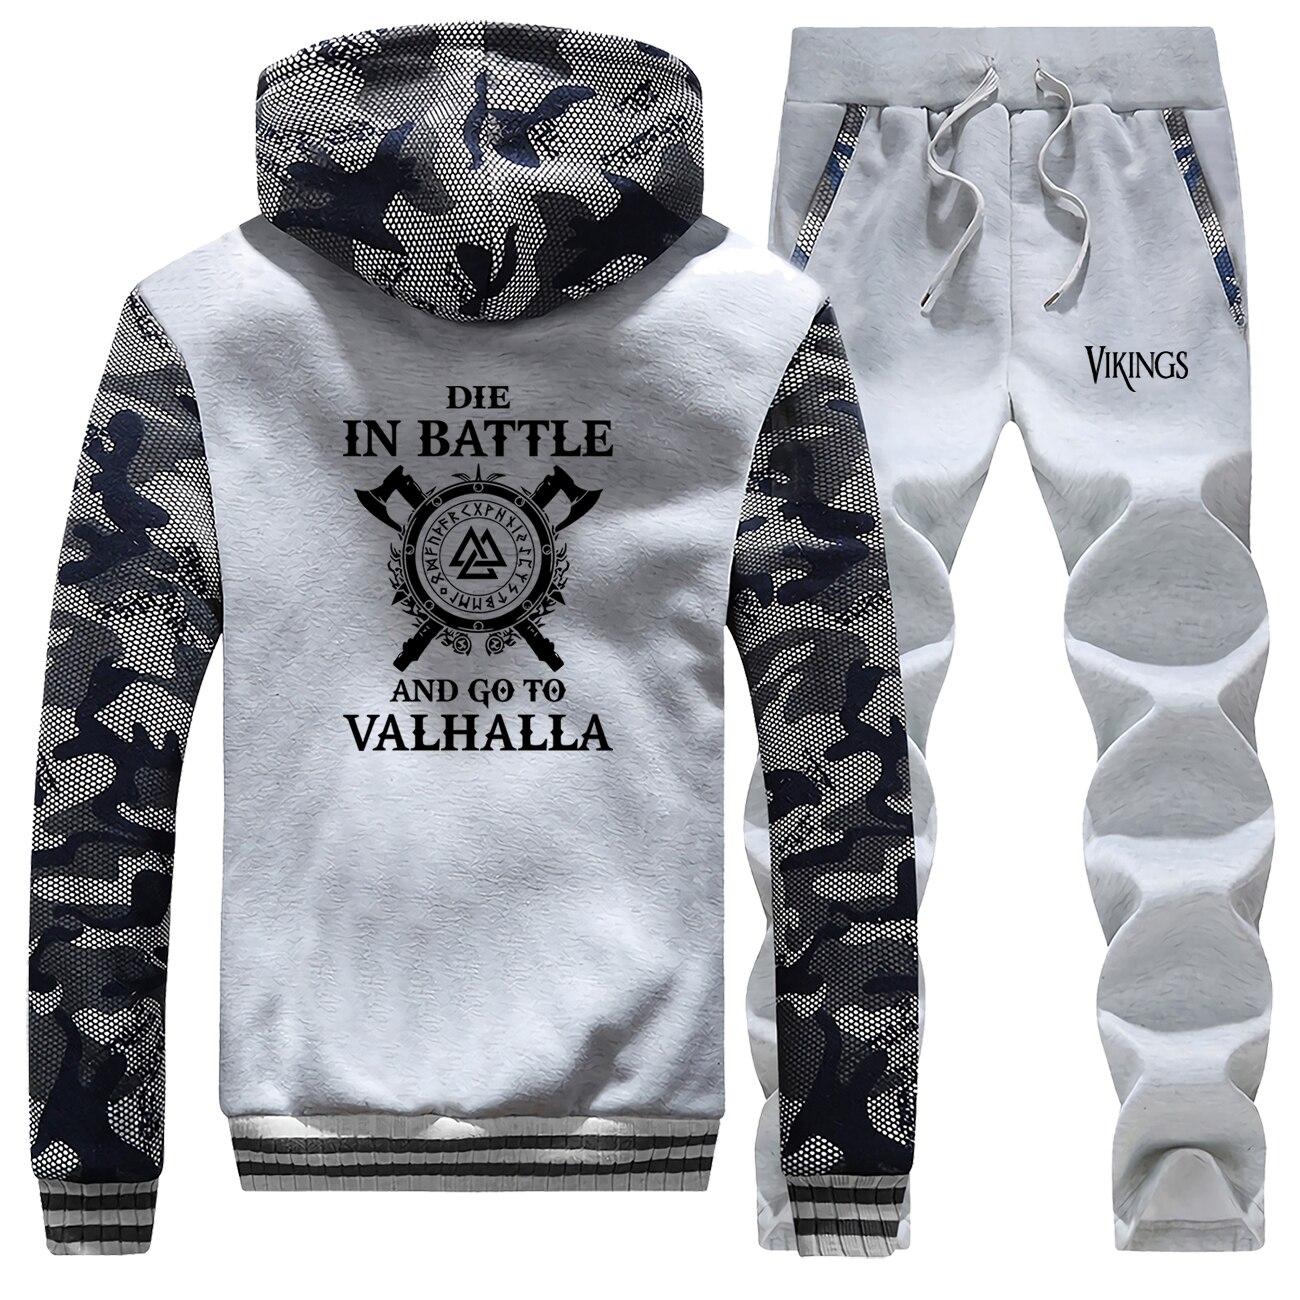 2019 Autumn Winter Hoodies Warm Suit Fashion Brand Hoodies Sweatshirt VIKINGS Men's Jackets+Pants 2 Piece Sets Men Thick Coat